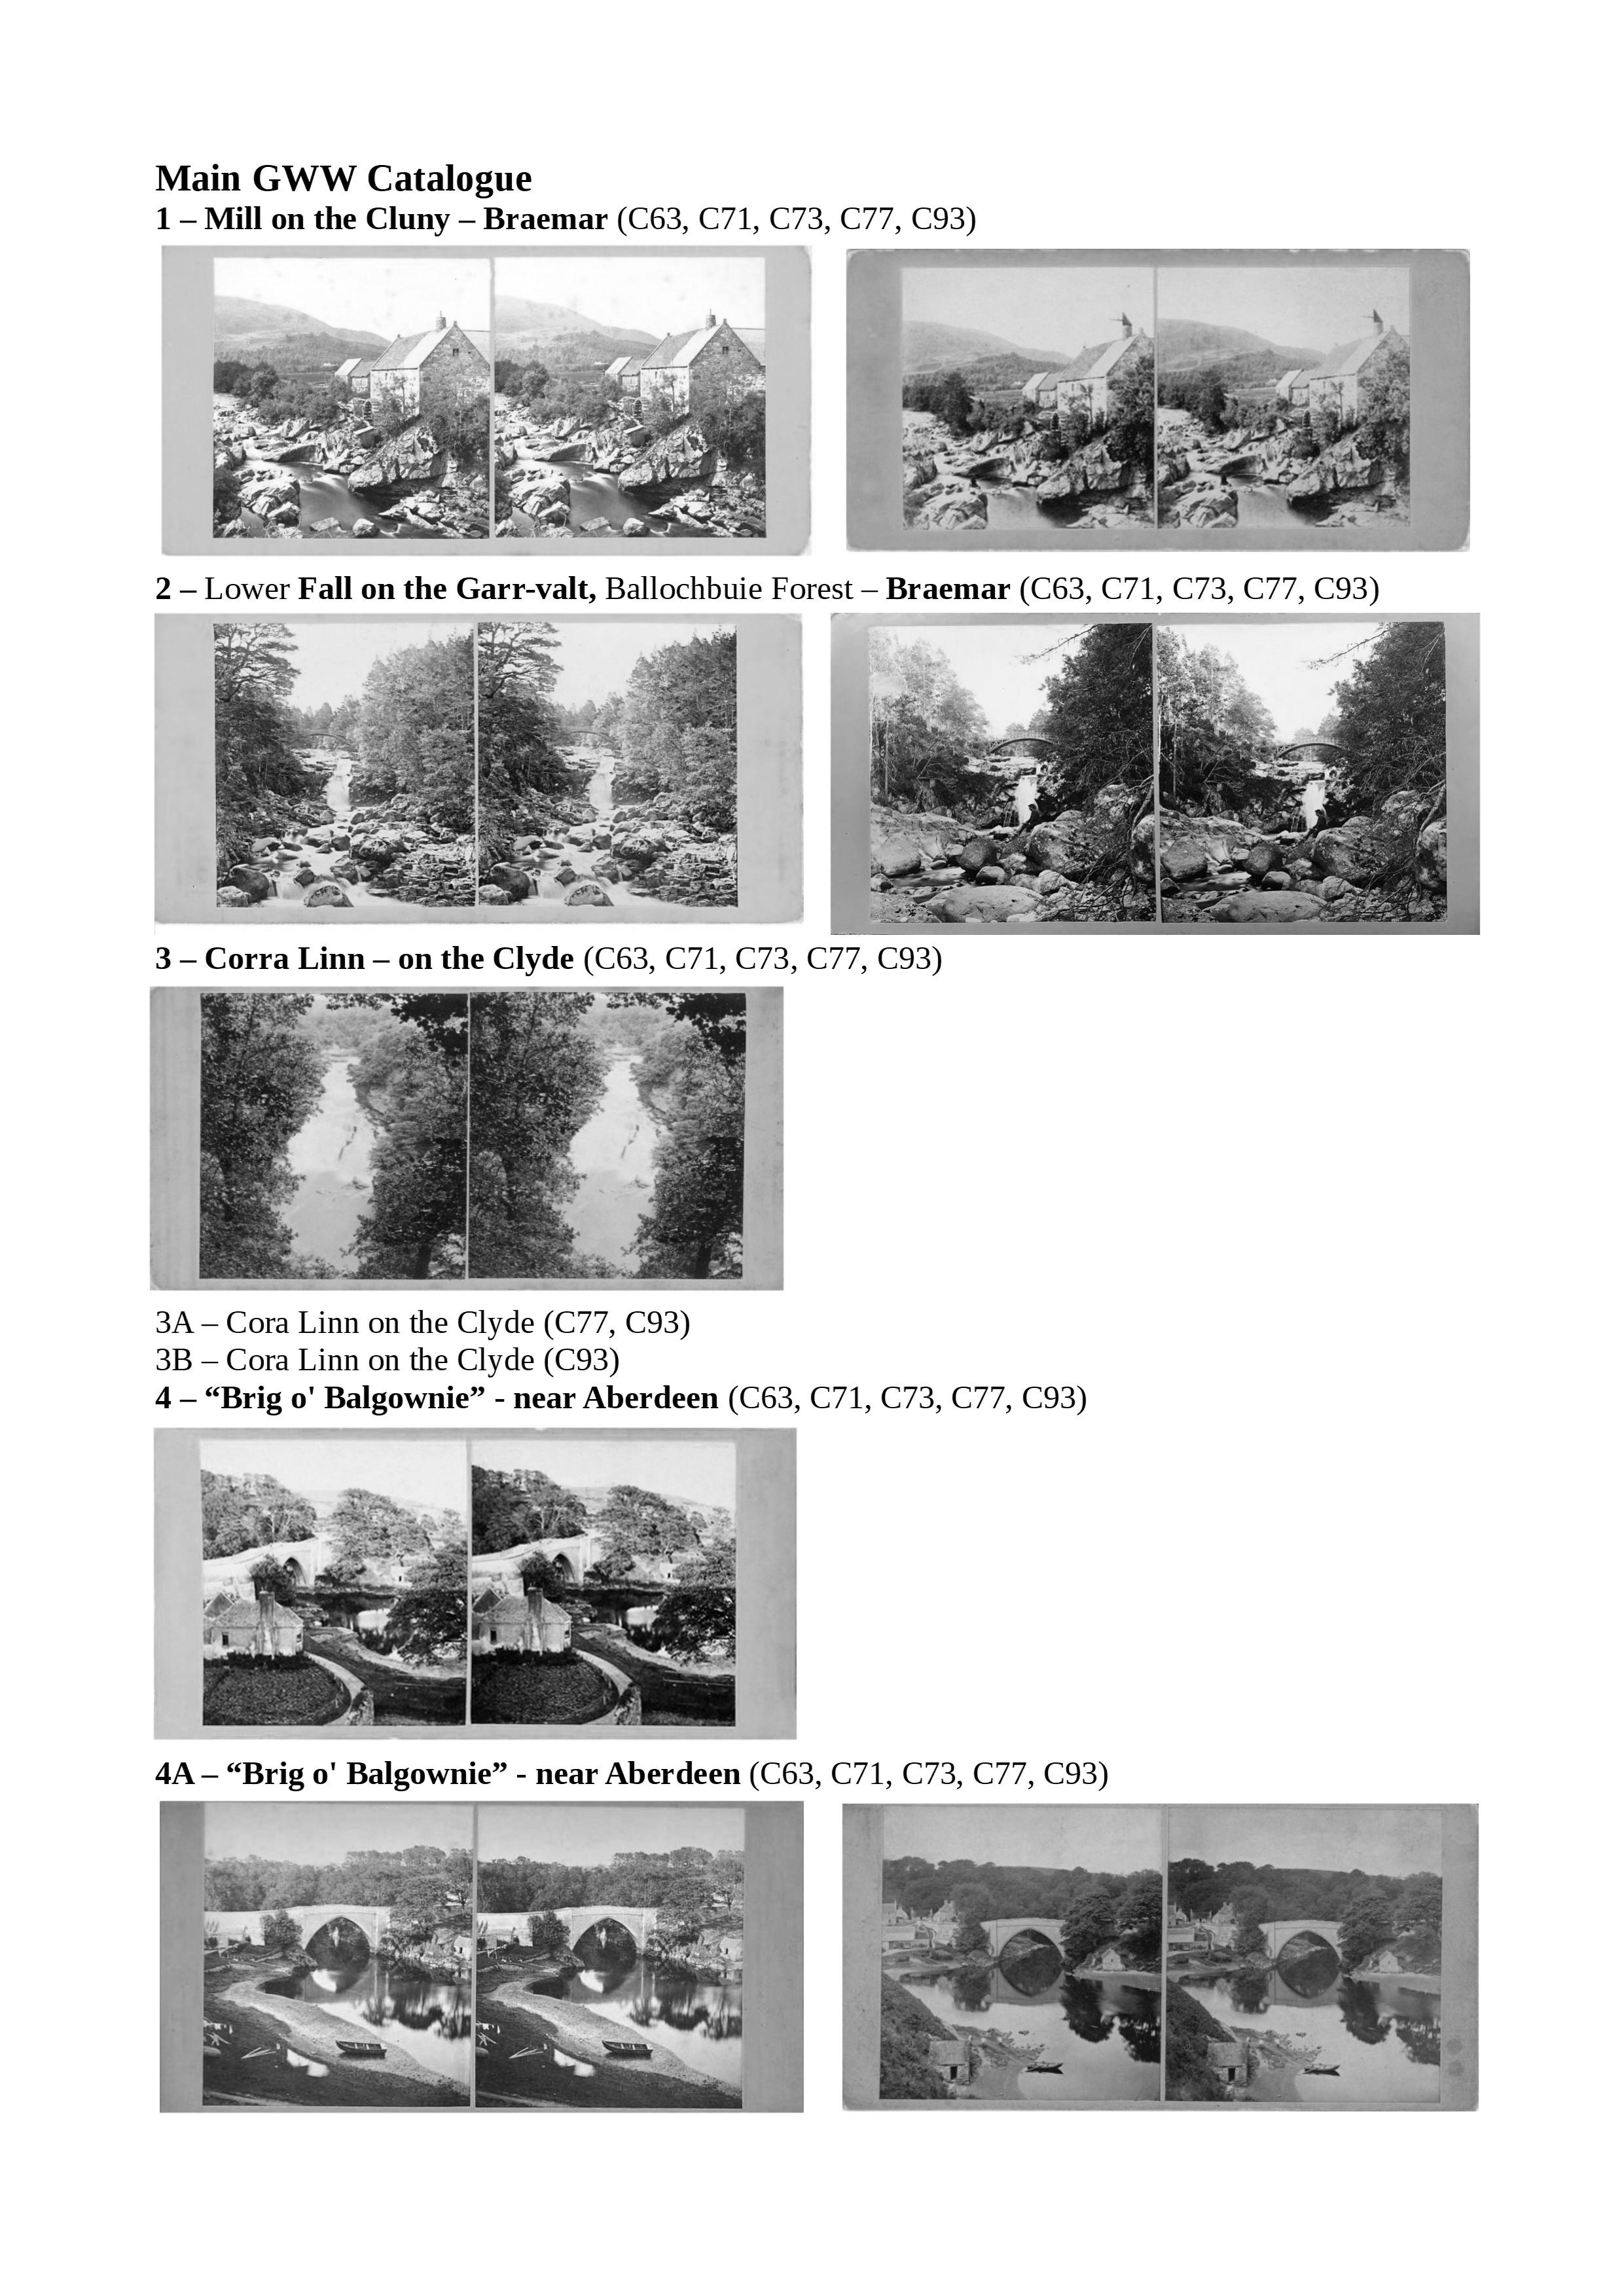 gww catalogue page 1.jpg